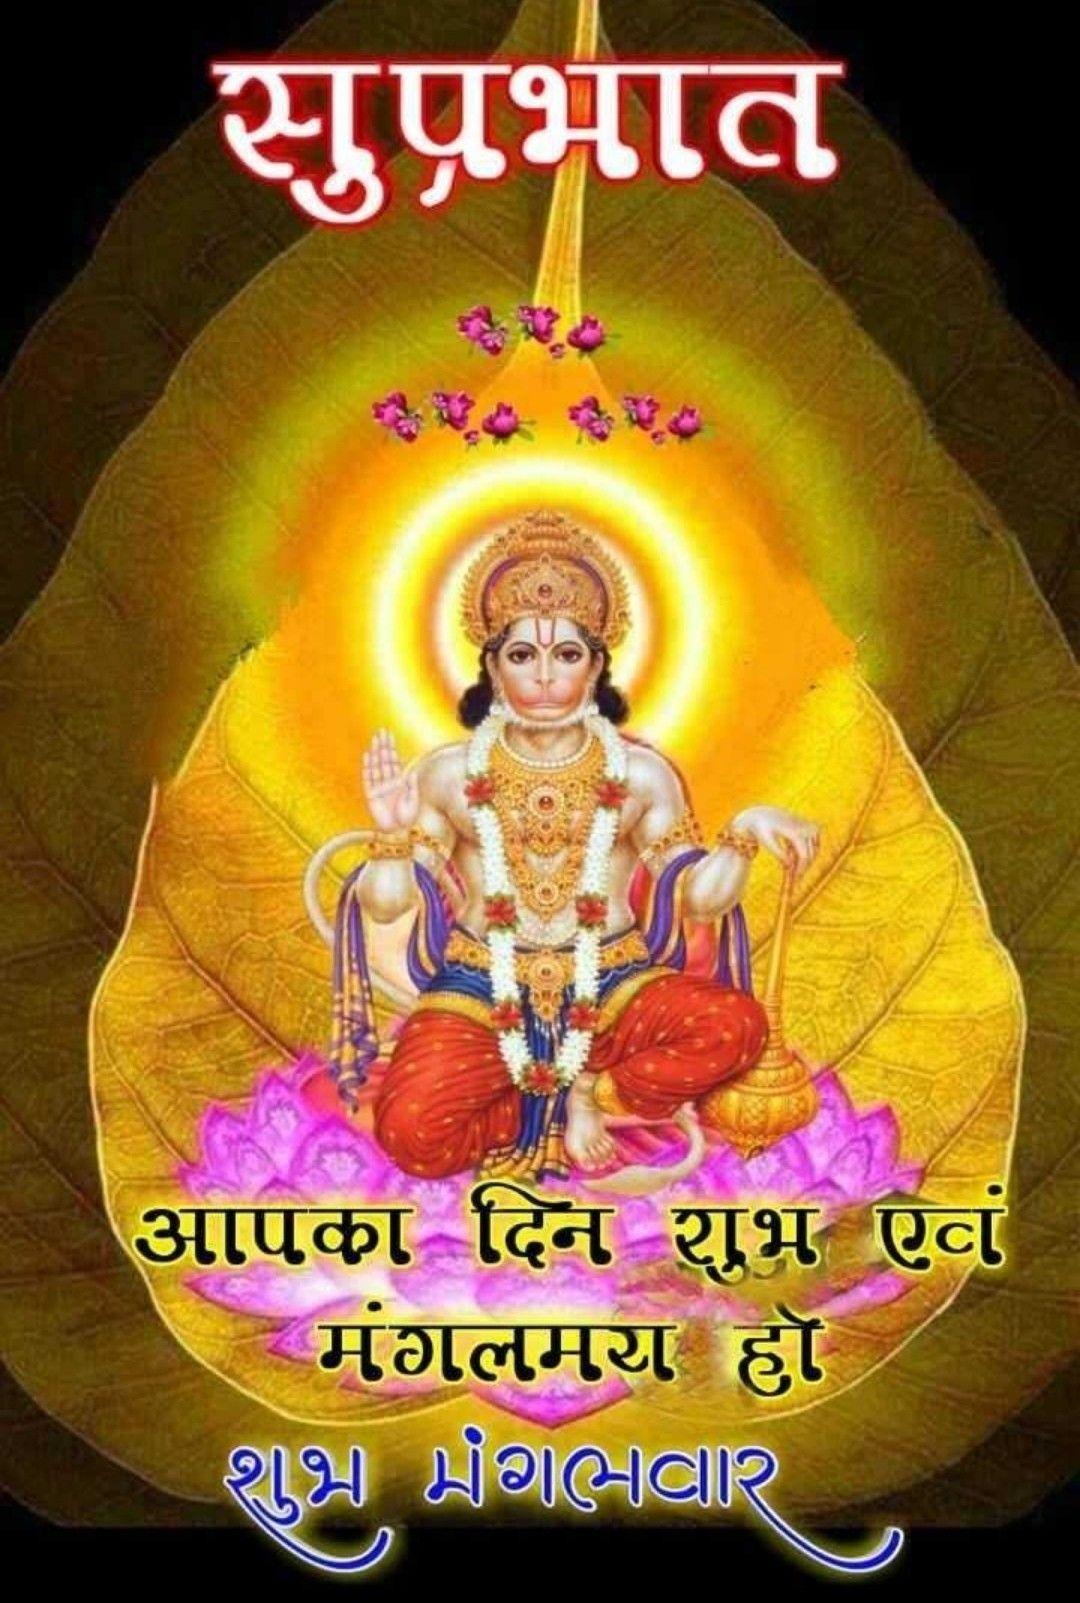 Pin by Ravinesh Kumar on Good morning | Image quotes ...